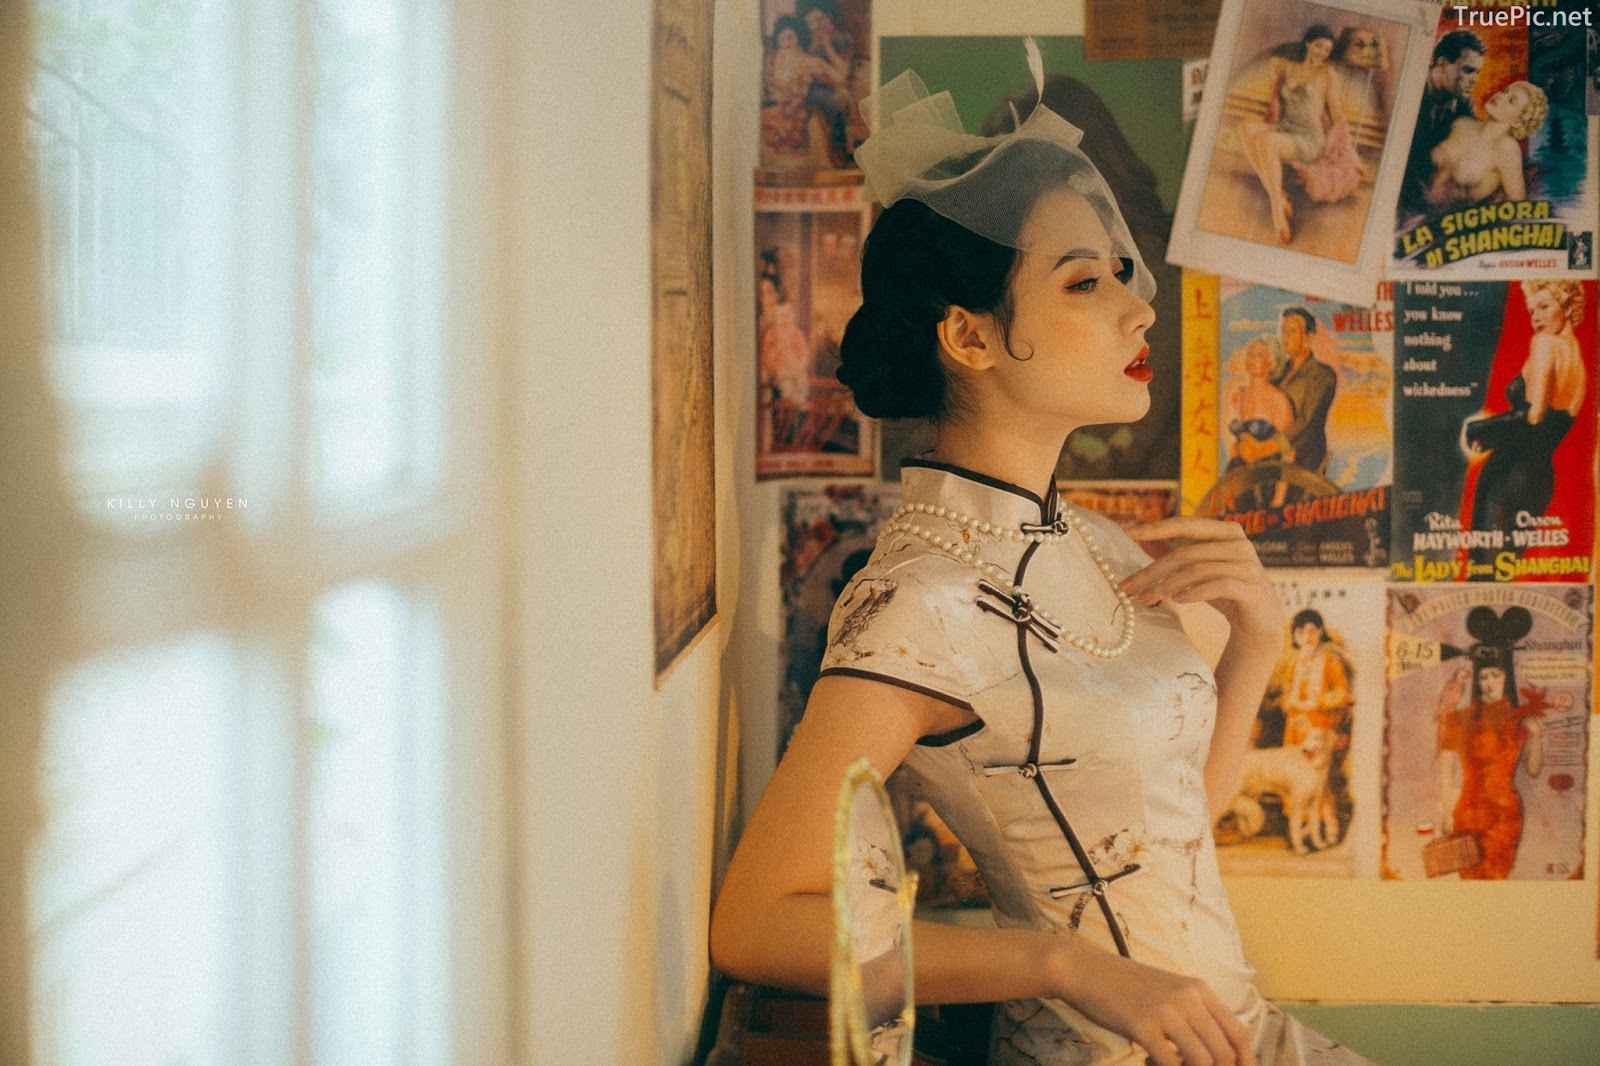 Vietnamese model Lan Huong - Lost in ShangHai - Photo by Killy Nguyen - TruePic.net - Picture 10